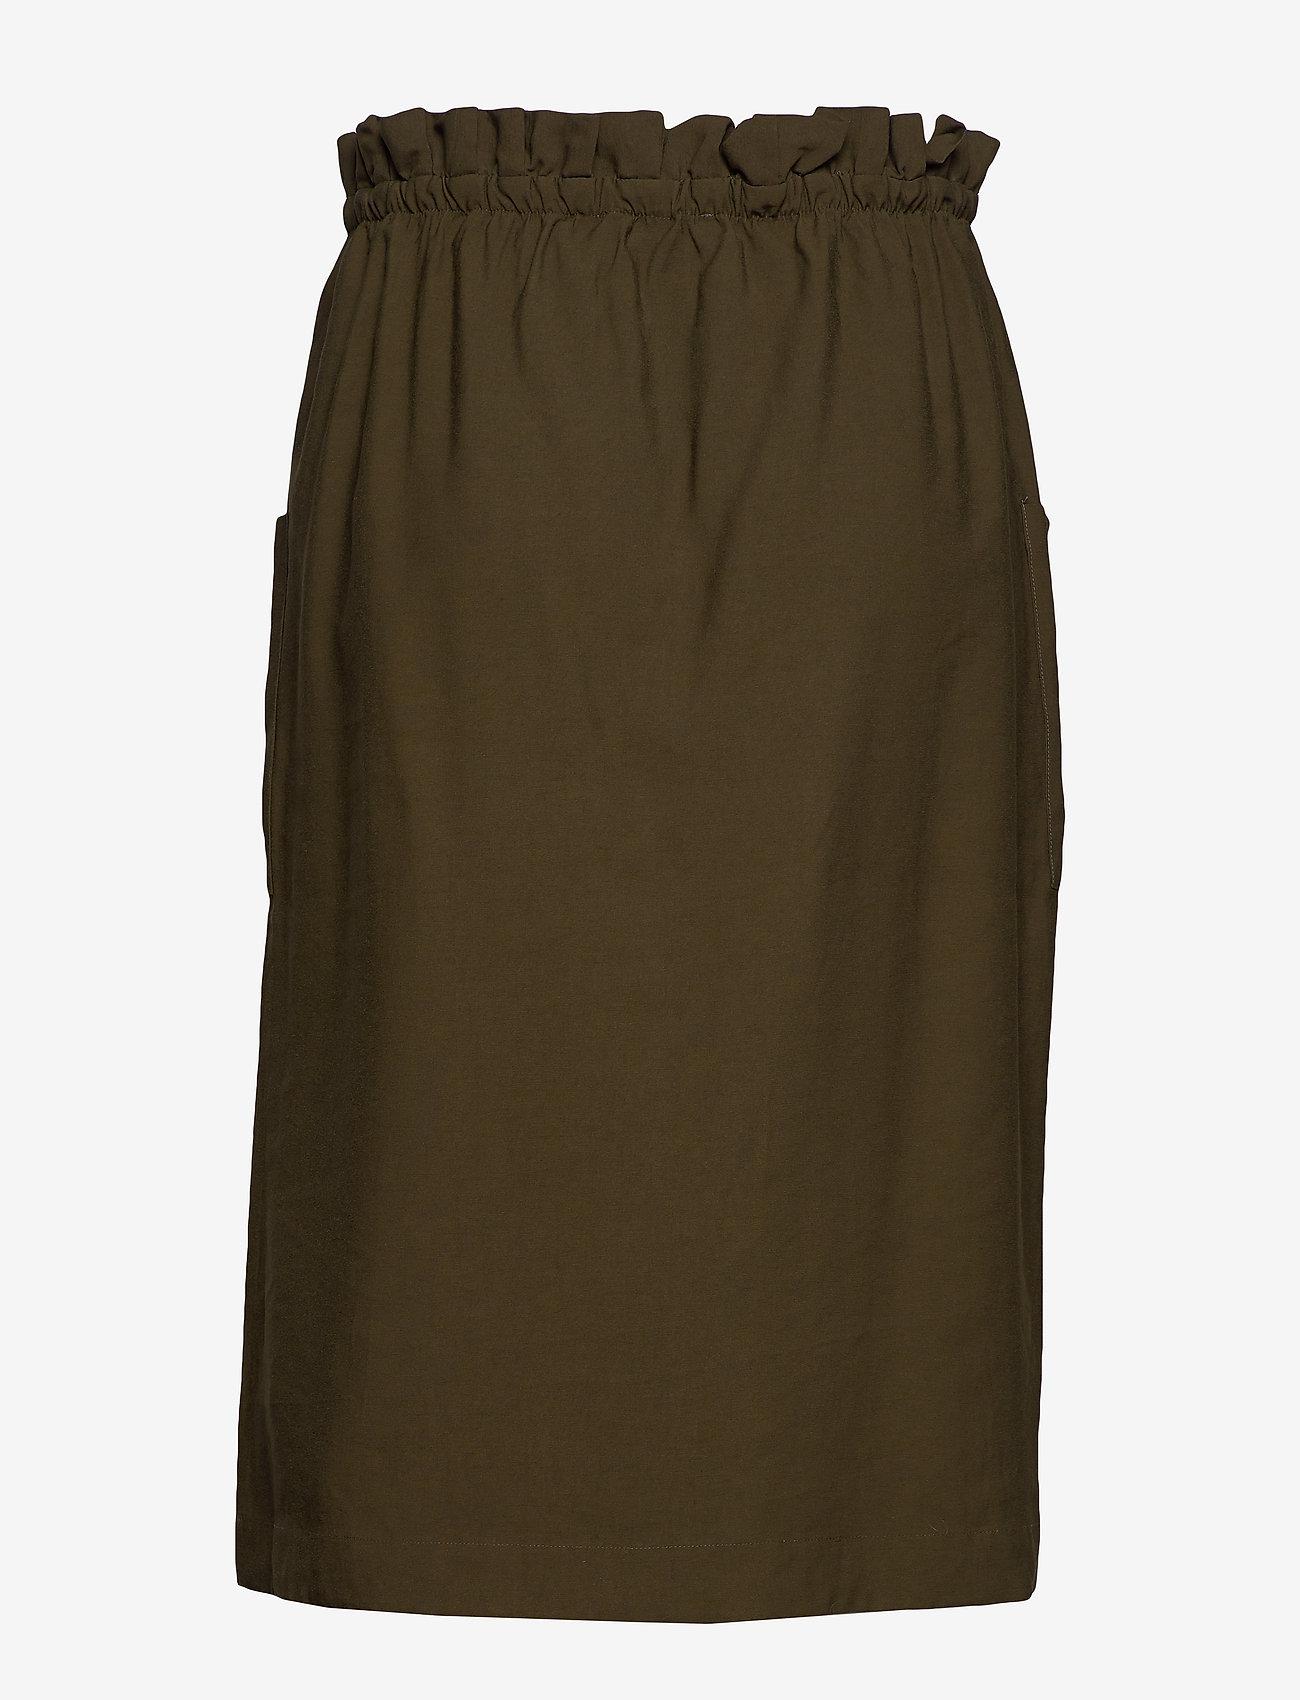 Carjanine Button Calf Skirt (Forest Night) (298.35 kr) - ONLY Carmakoma